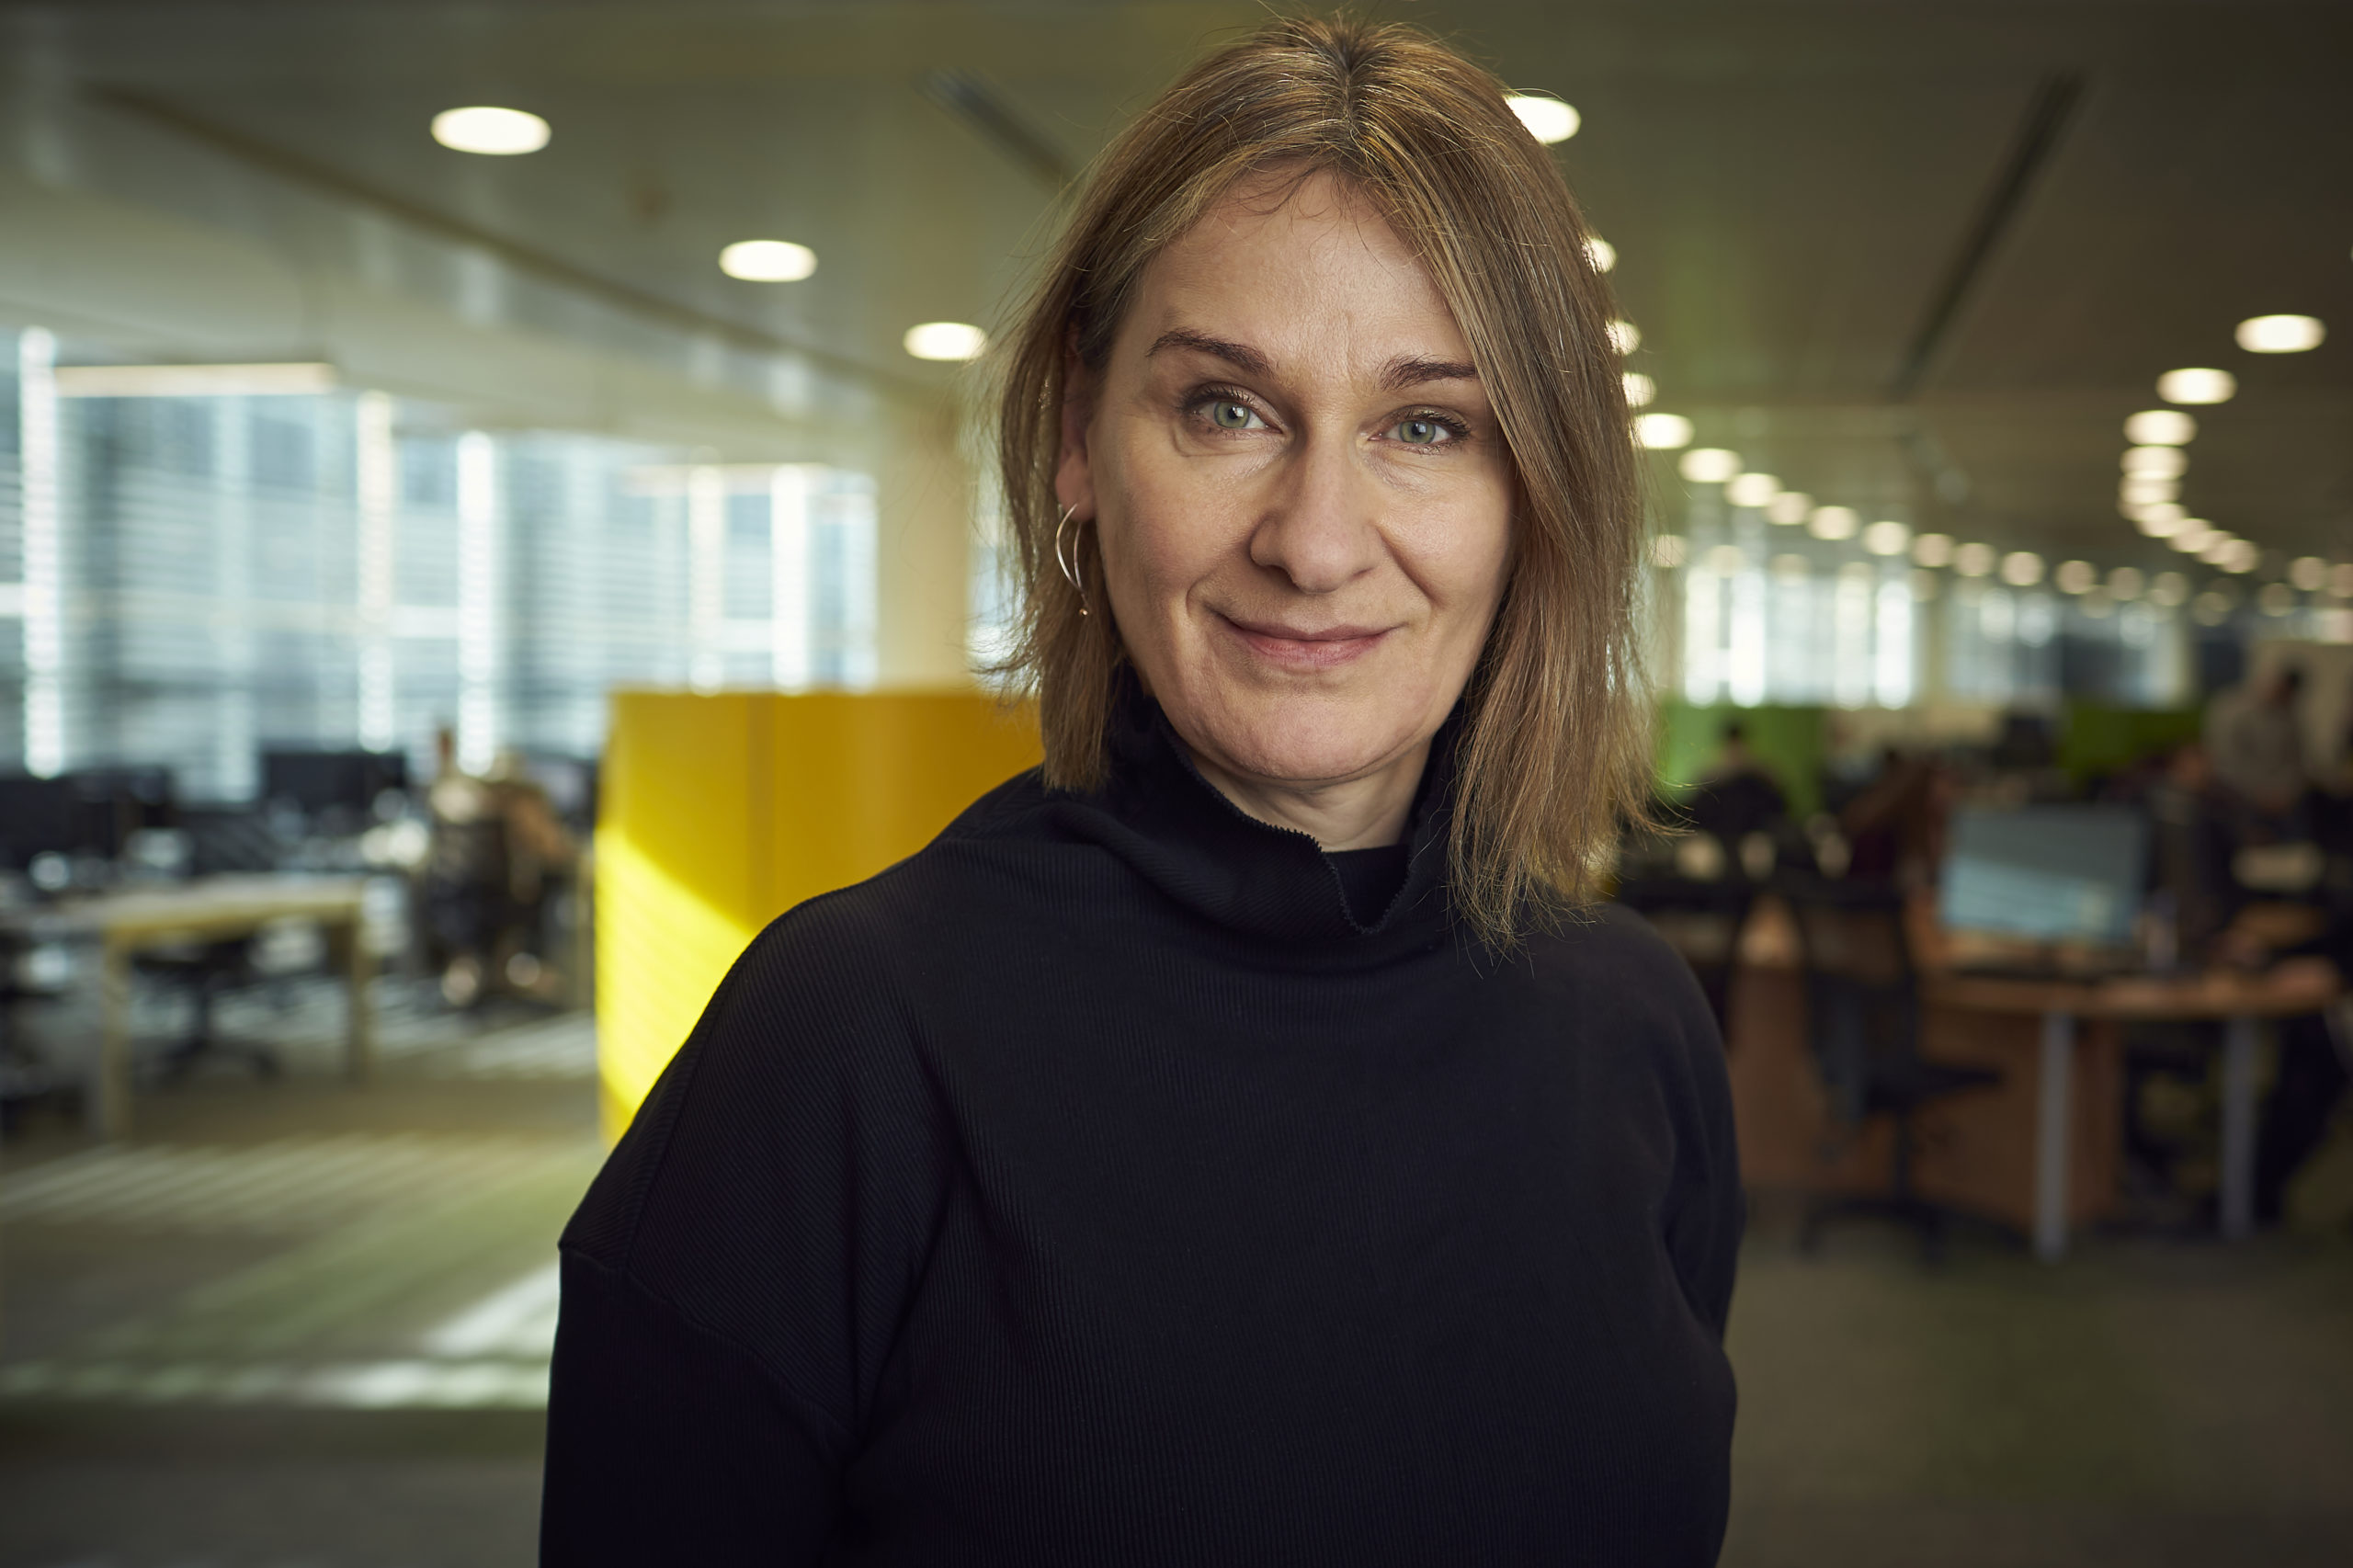 Professor Vera Kempe, chair of psychology of language learning at Abertay University.